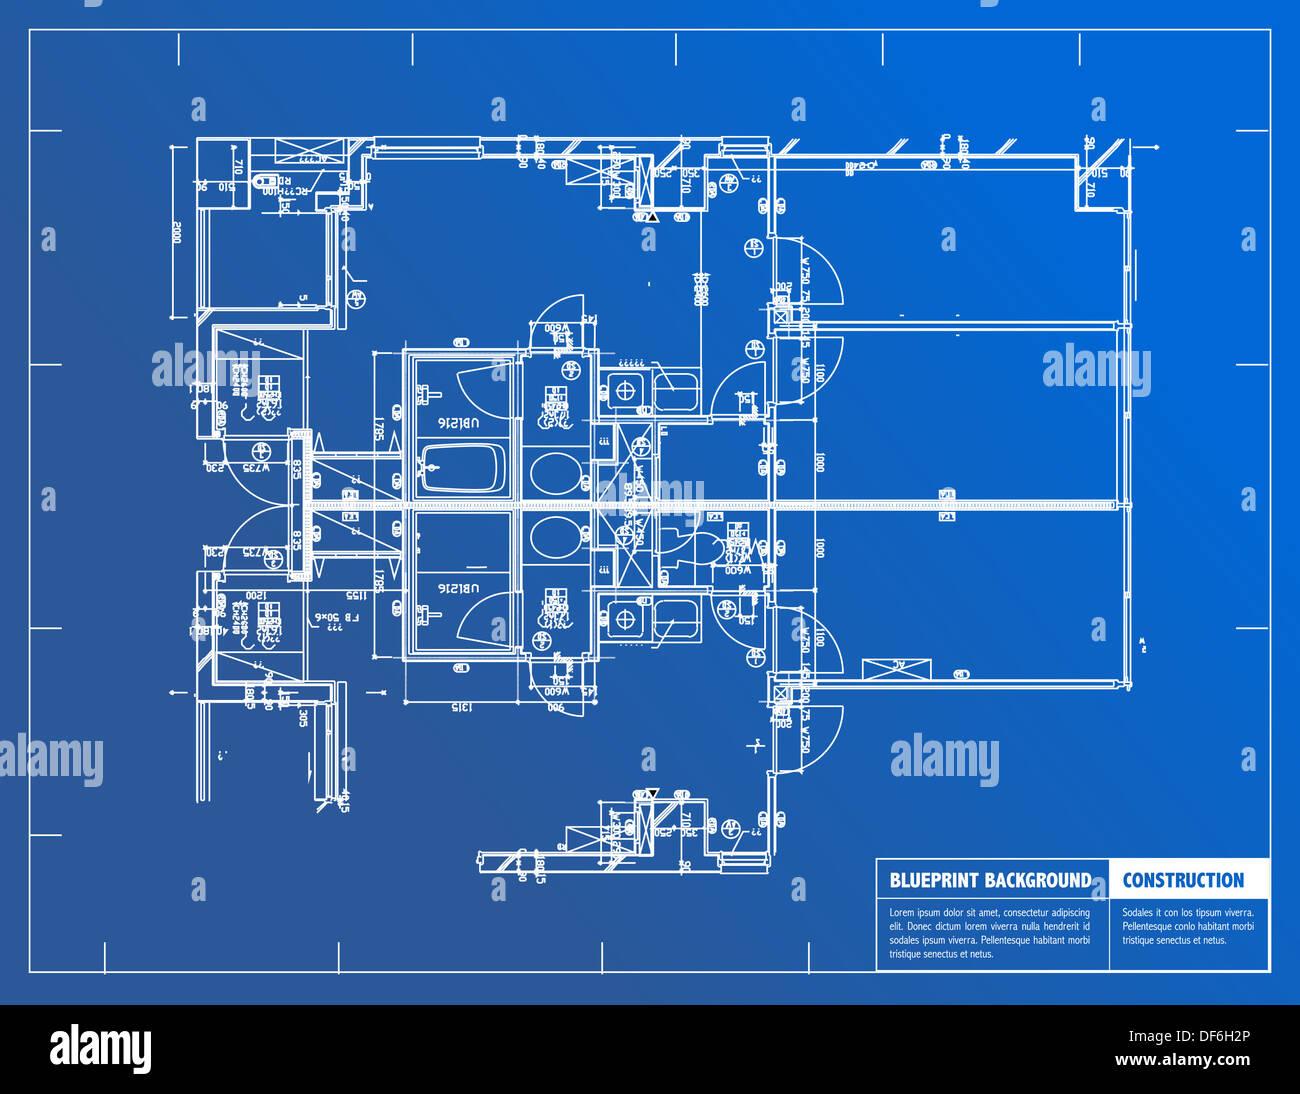 Plumbing blueprint diagram stock photos plumbing blueprint diagram sample of architectural blueprints over a blue background blueprint stock image malvernweather Images